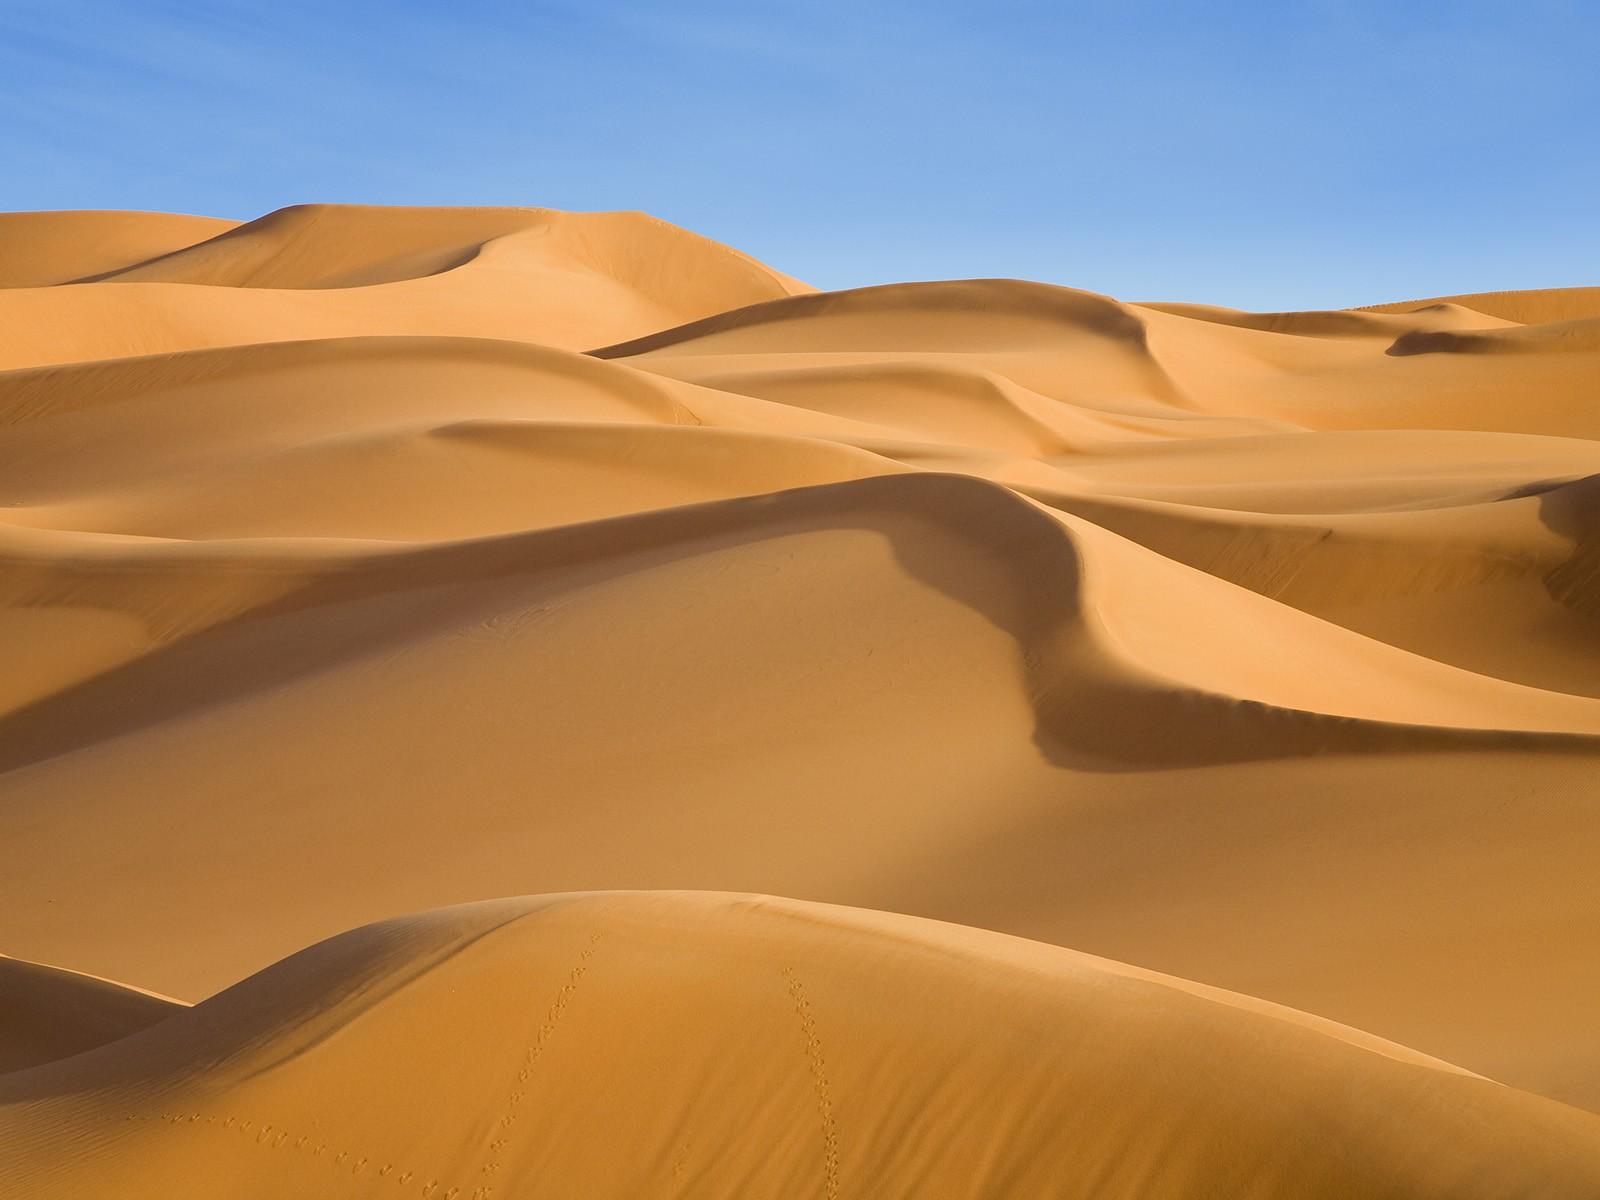 desert landscape wallpaper 1600x1200